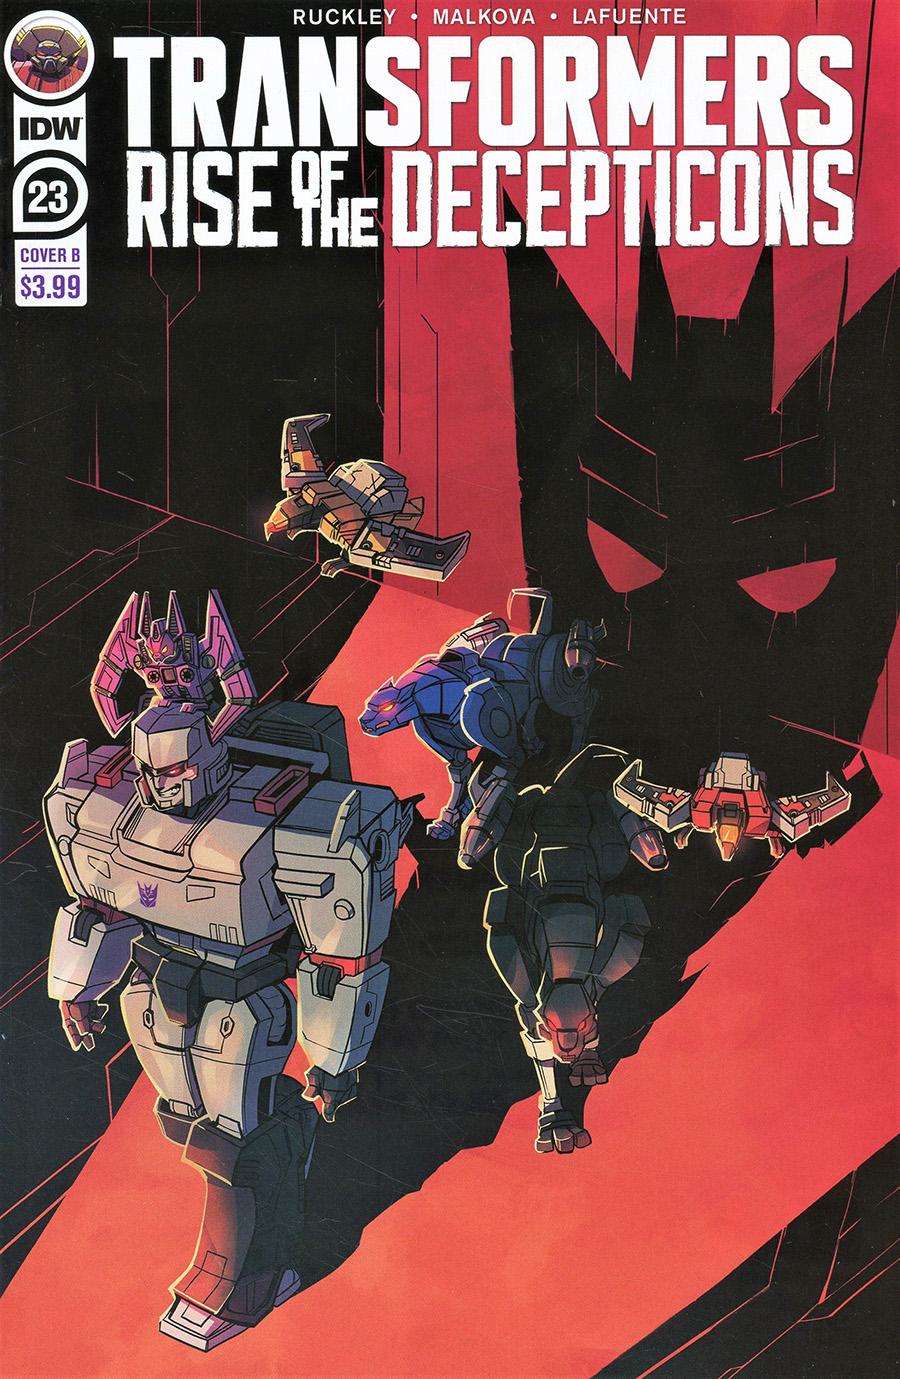 Transformers Vol 4 #23 Cover B Variant Aline Herzspalter Baumgartner Cover